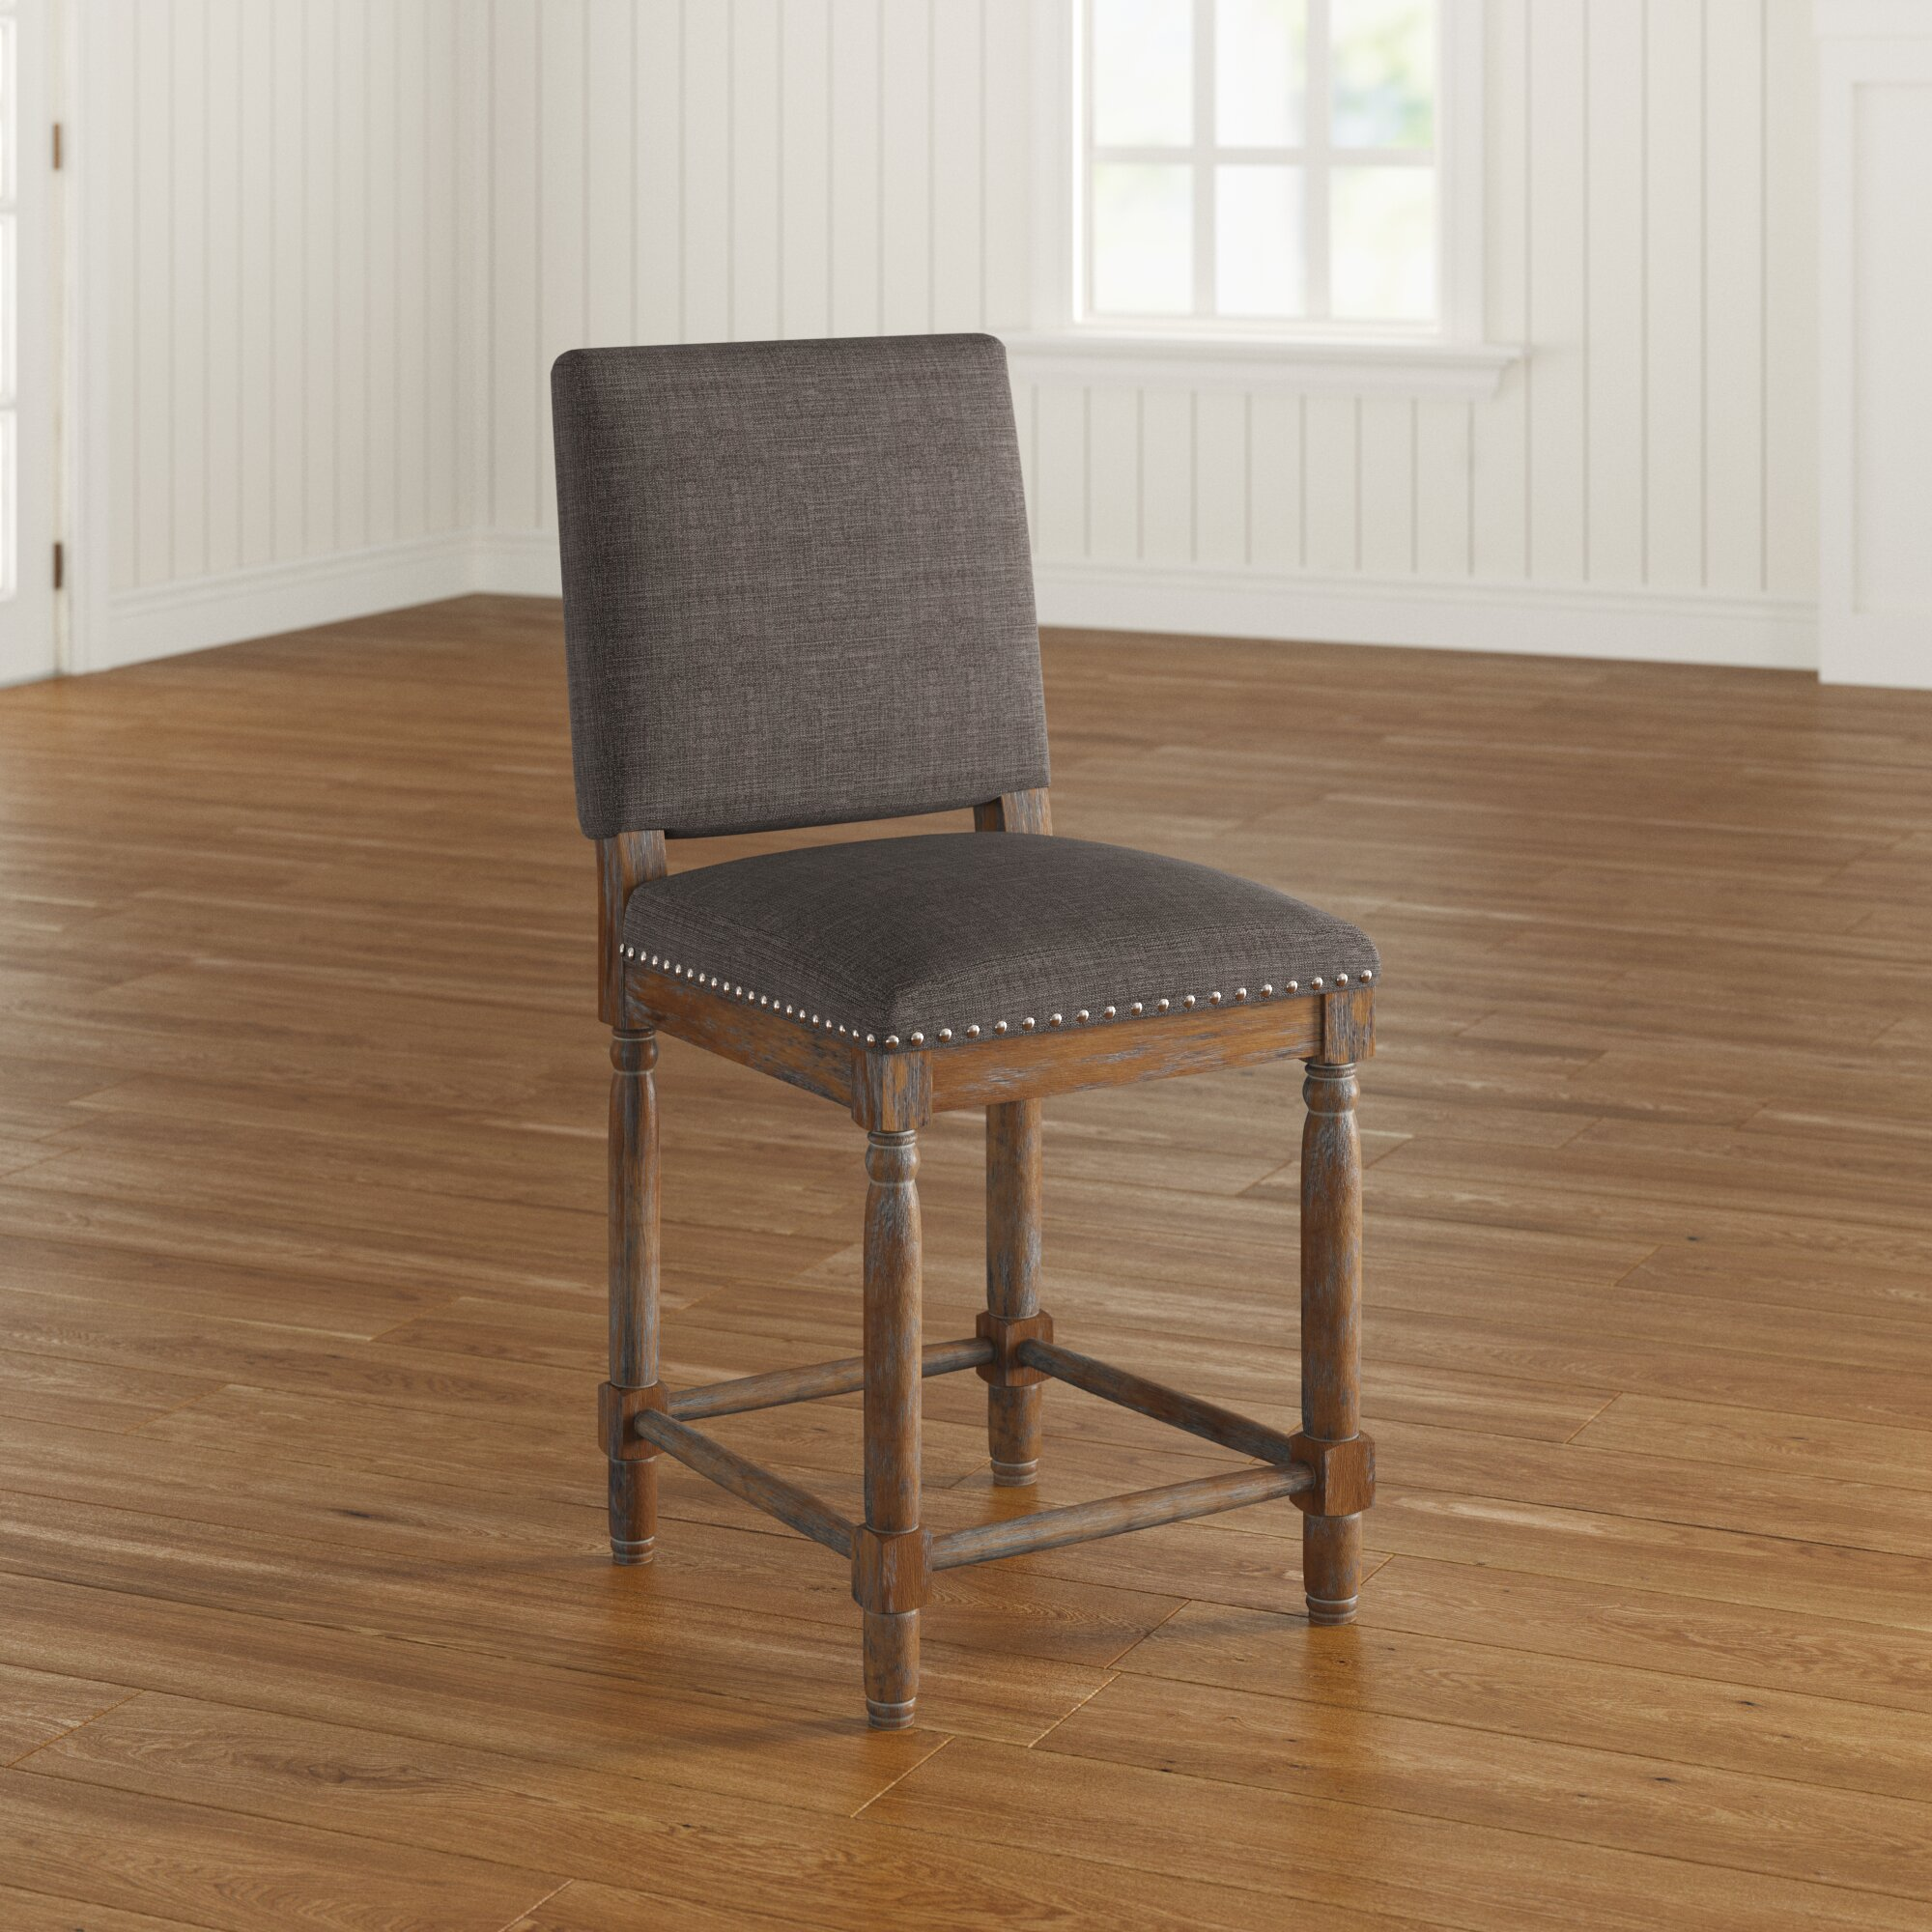 Swell Remy 25 Bar Stool Spiritservingveterans Wood Chair Design Ideas Spiritservingveteransorg